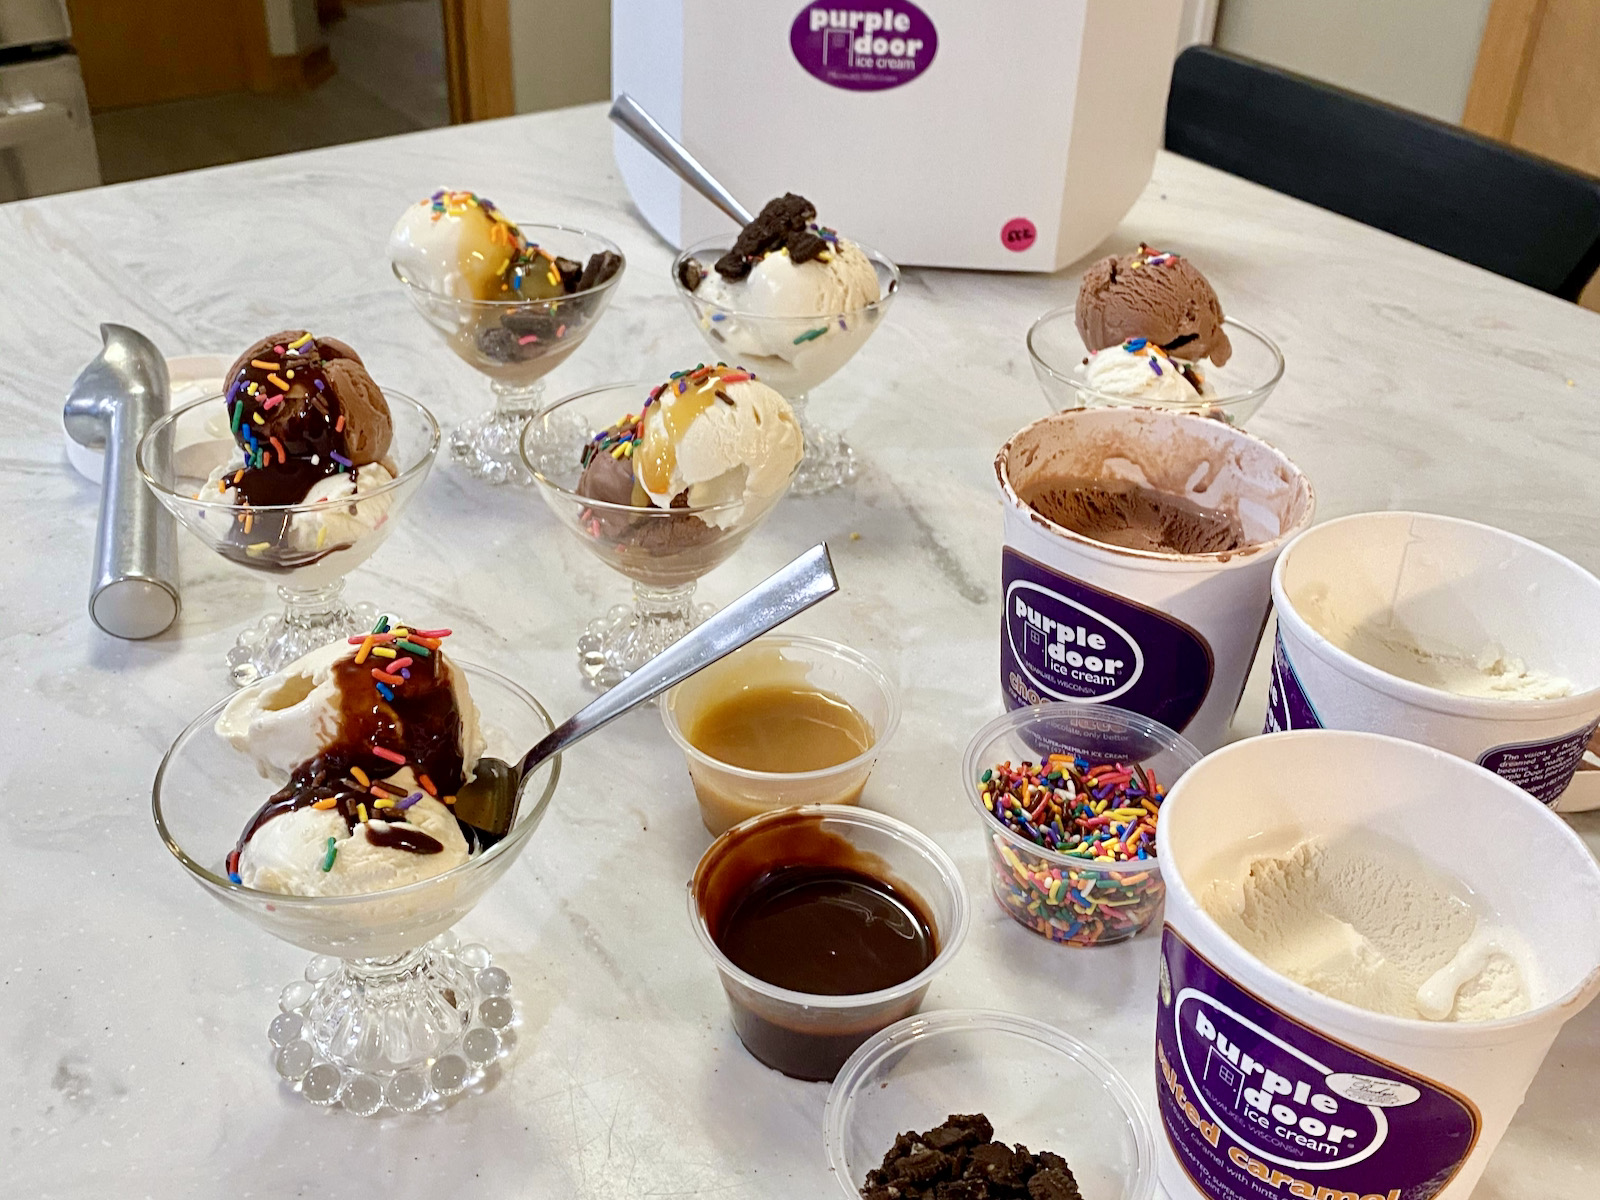 Purple Door Ice Cream sundae survival kit